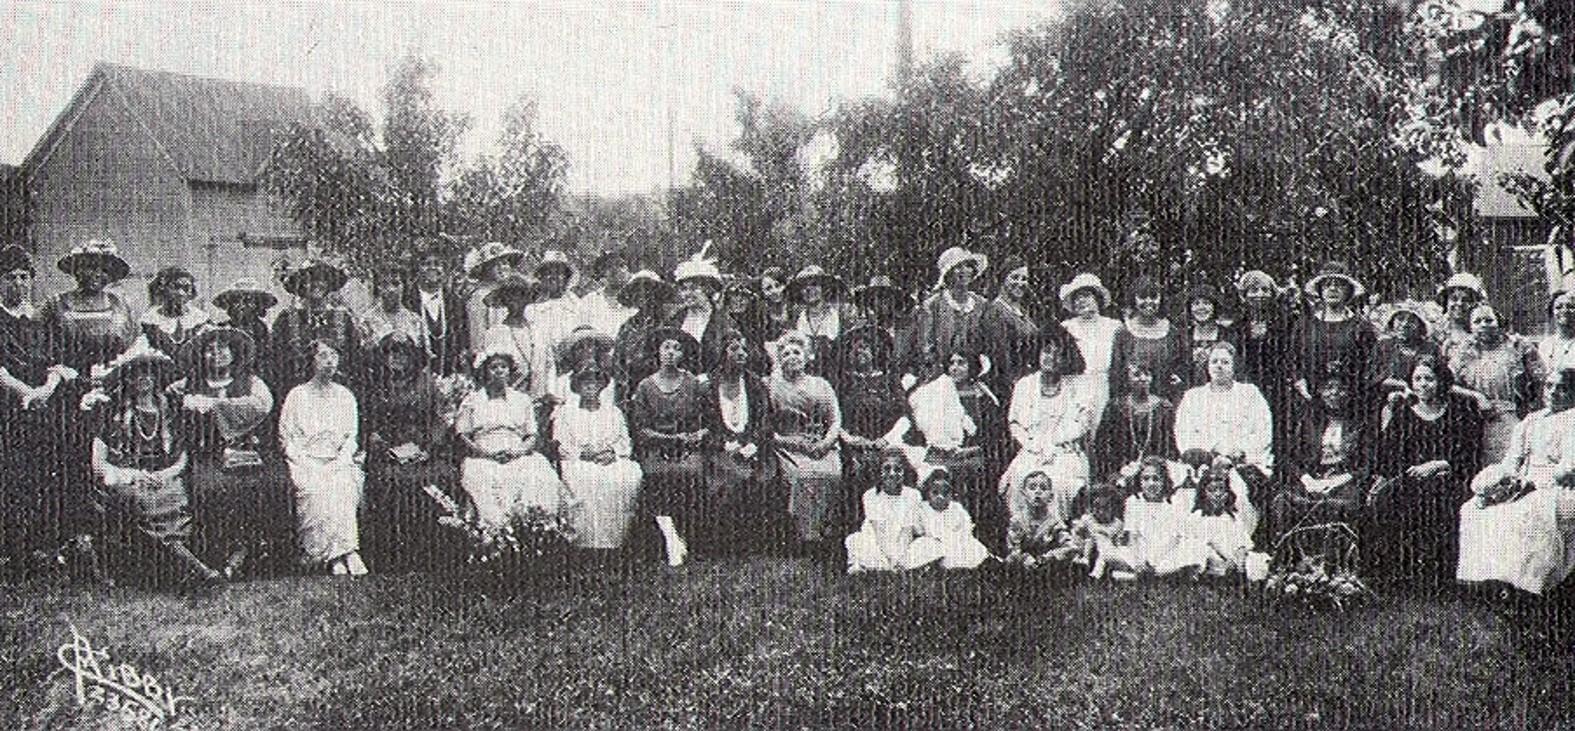 Spokane Club, 1917, Washington State Federation of Colored Women's Clubs